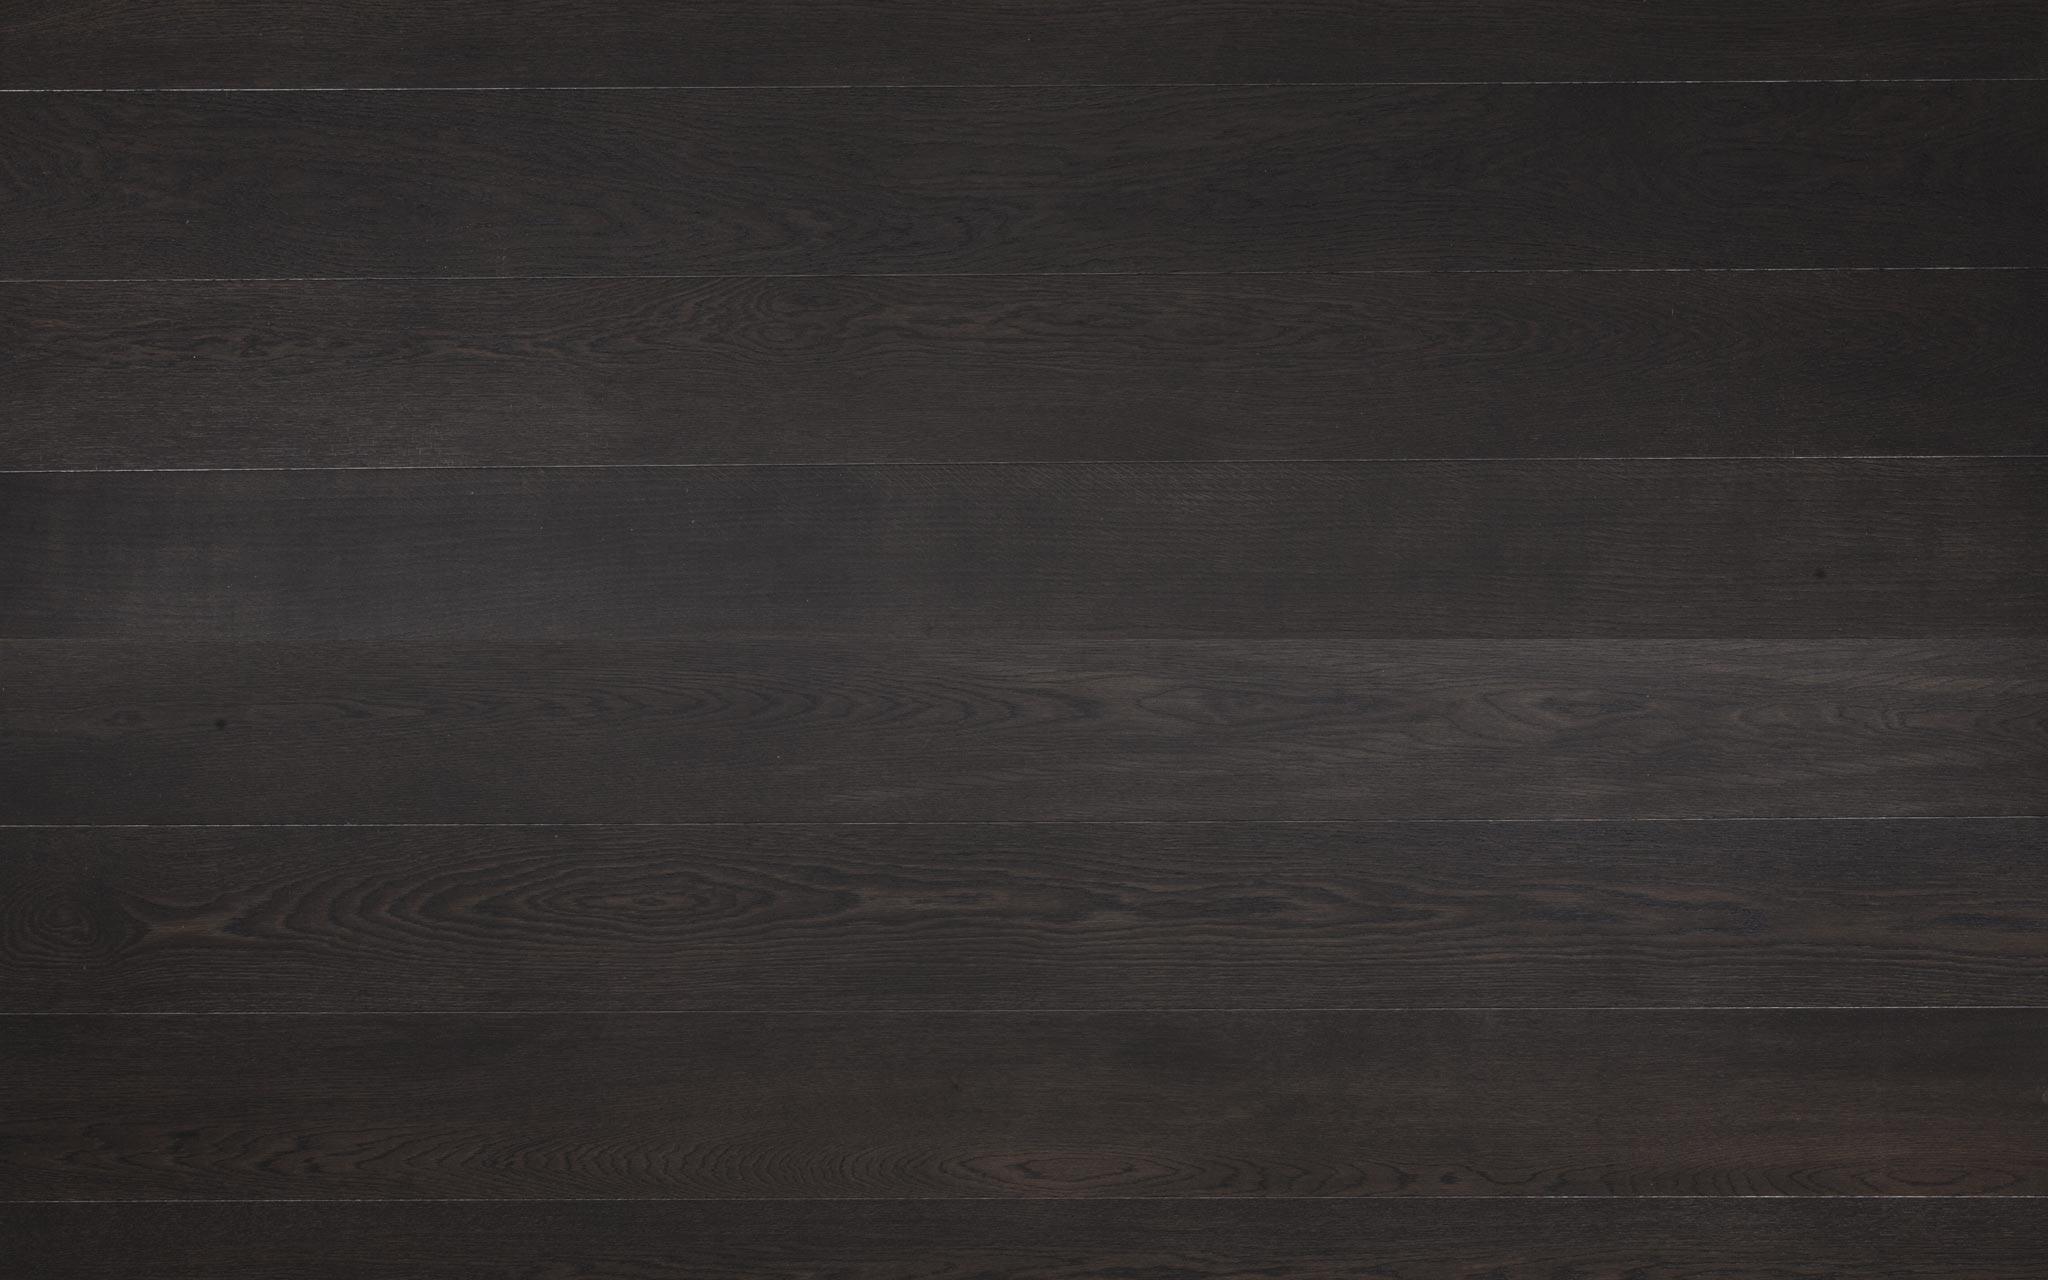 Listone Giordano Siena 1179 lg michaelangelo testa di moro | marble trend | marble